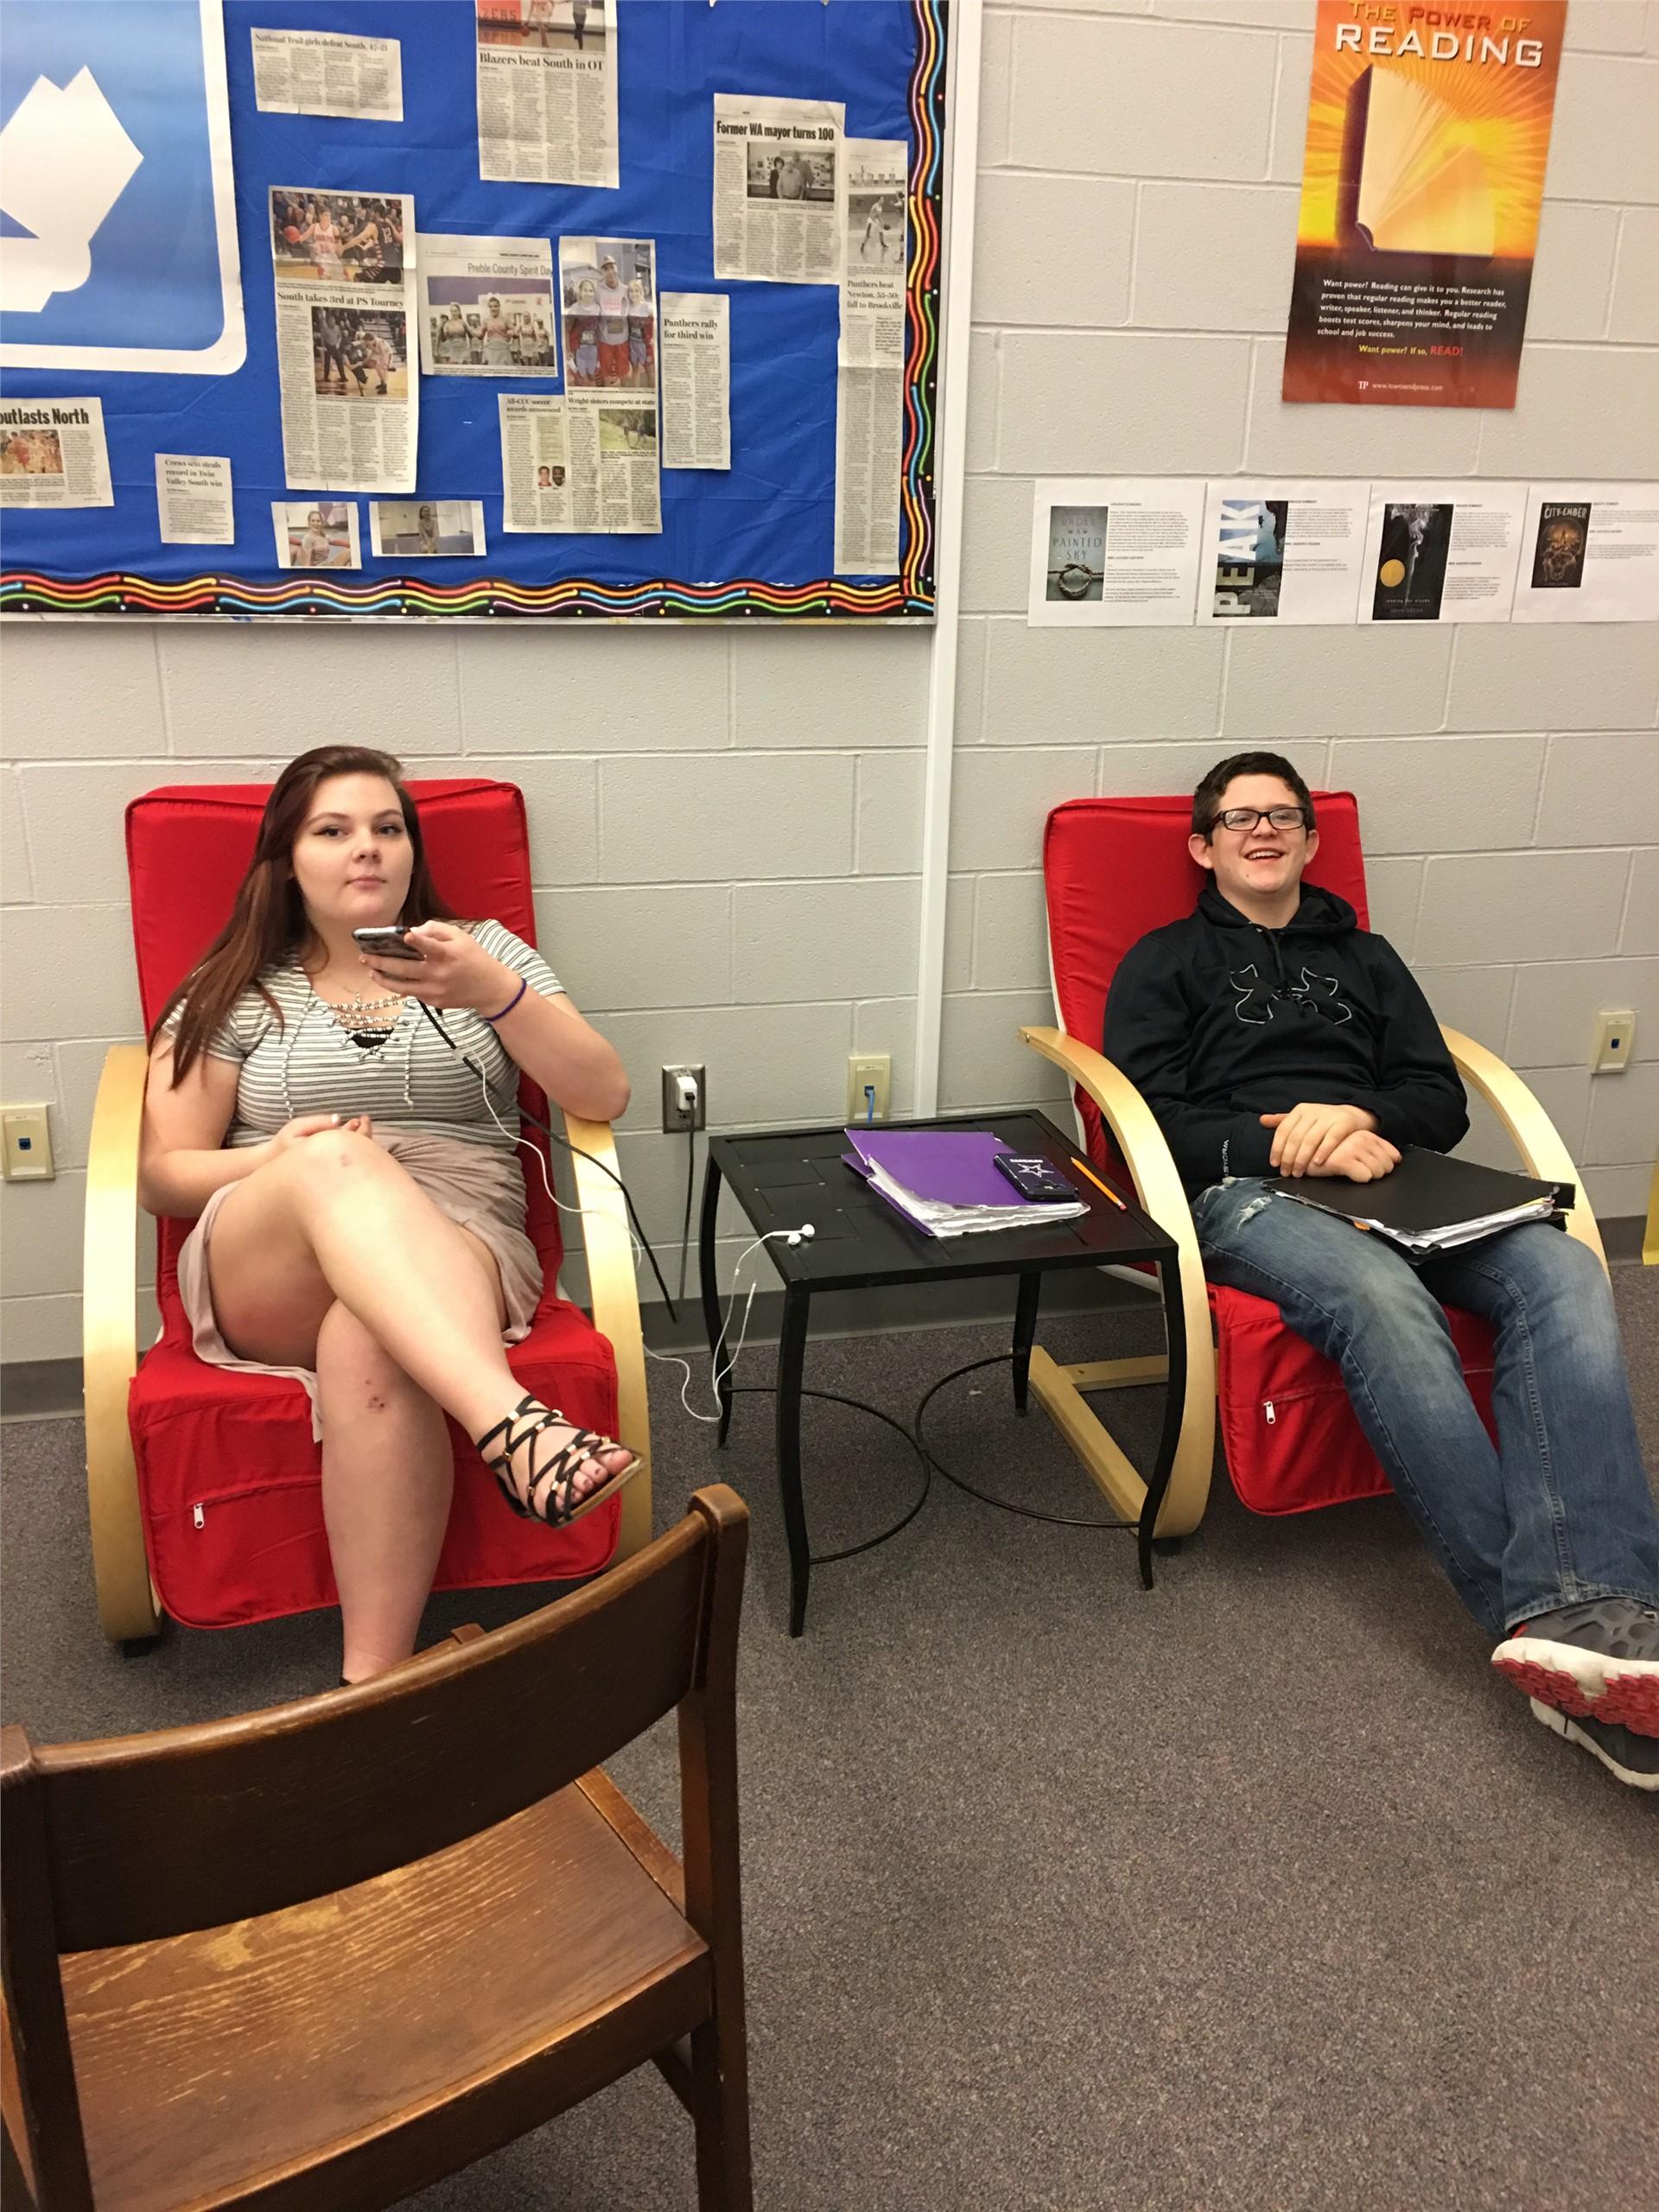 Students enjoying the comfortable furniture